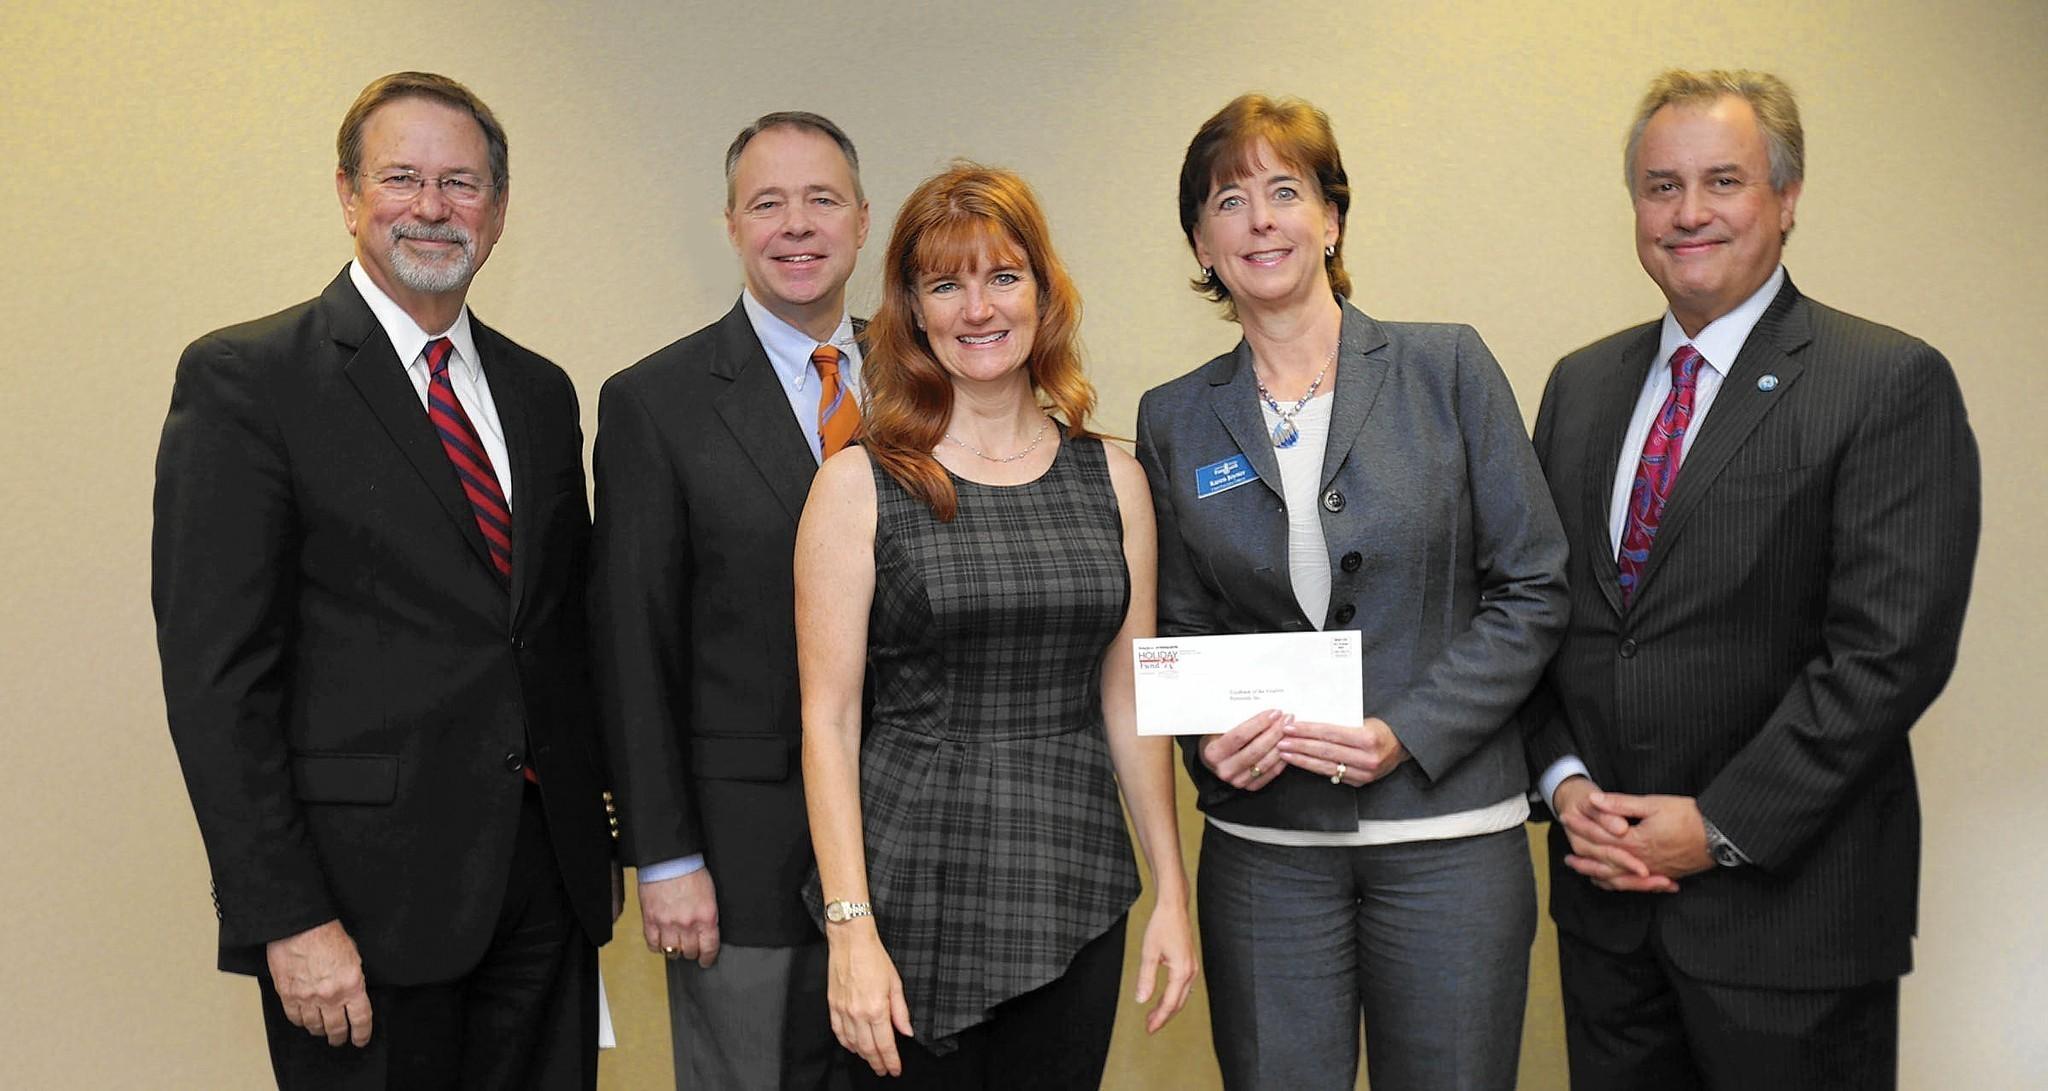 Virginia Peninsula Foodbank provides food with help of Daily